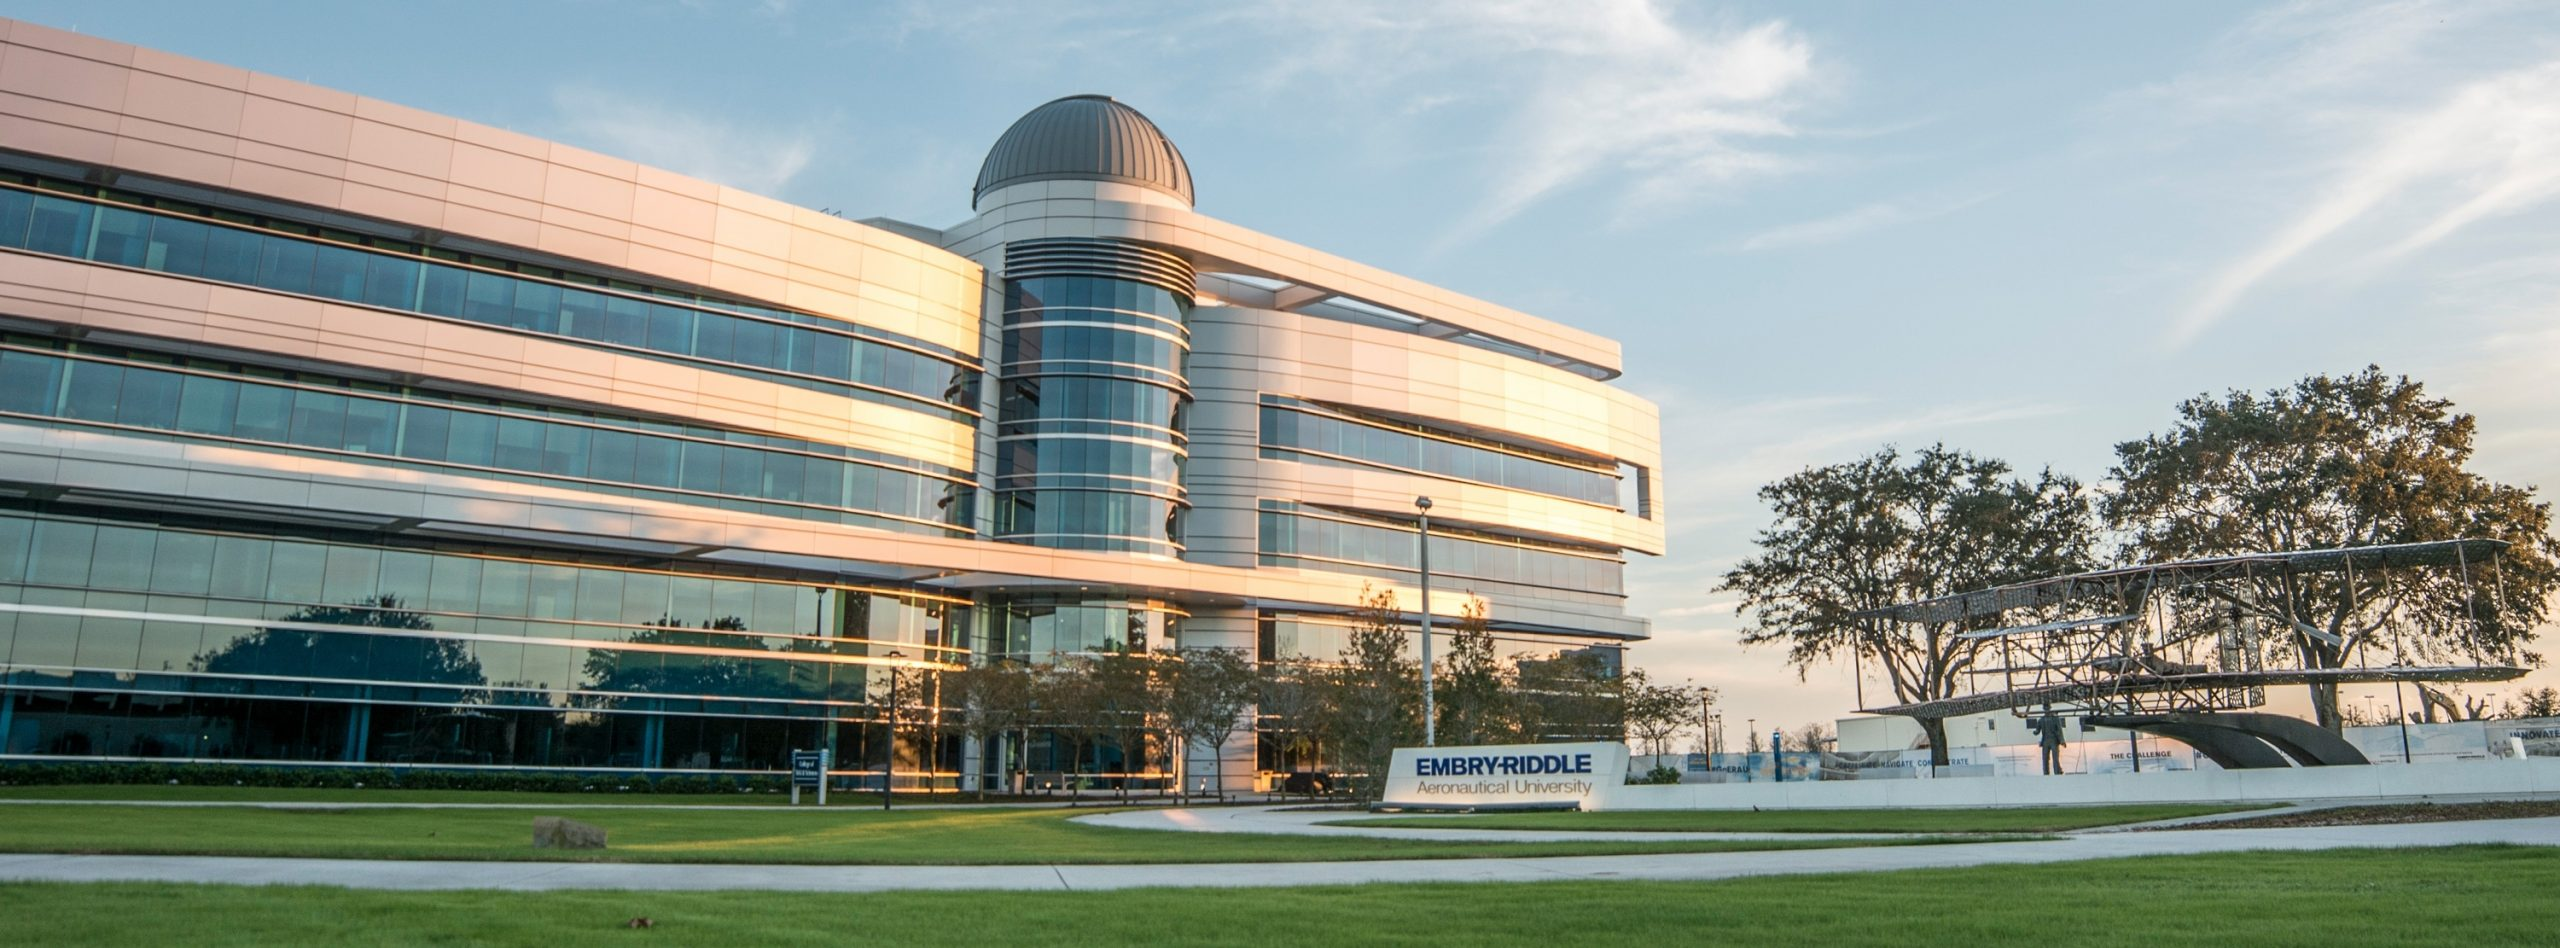 Embry Riddle Aeronautical University Daytona Beach